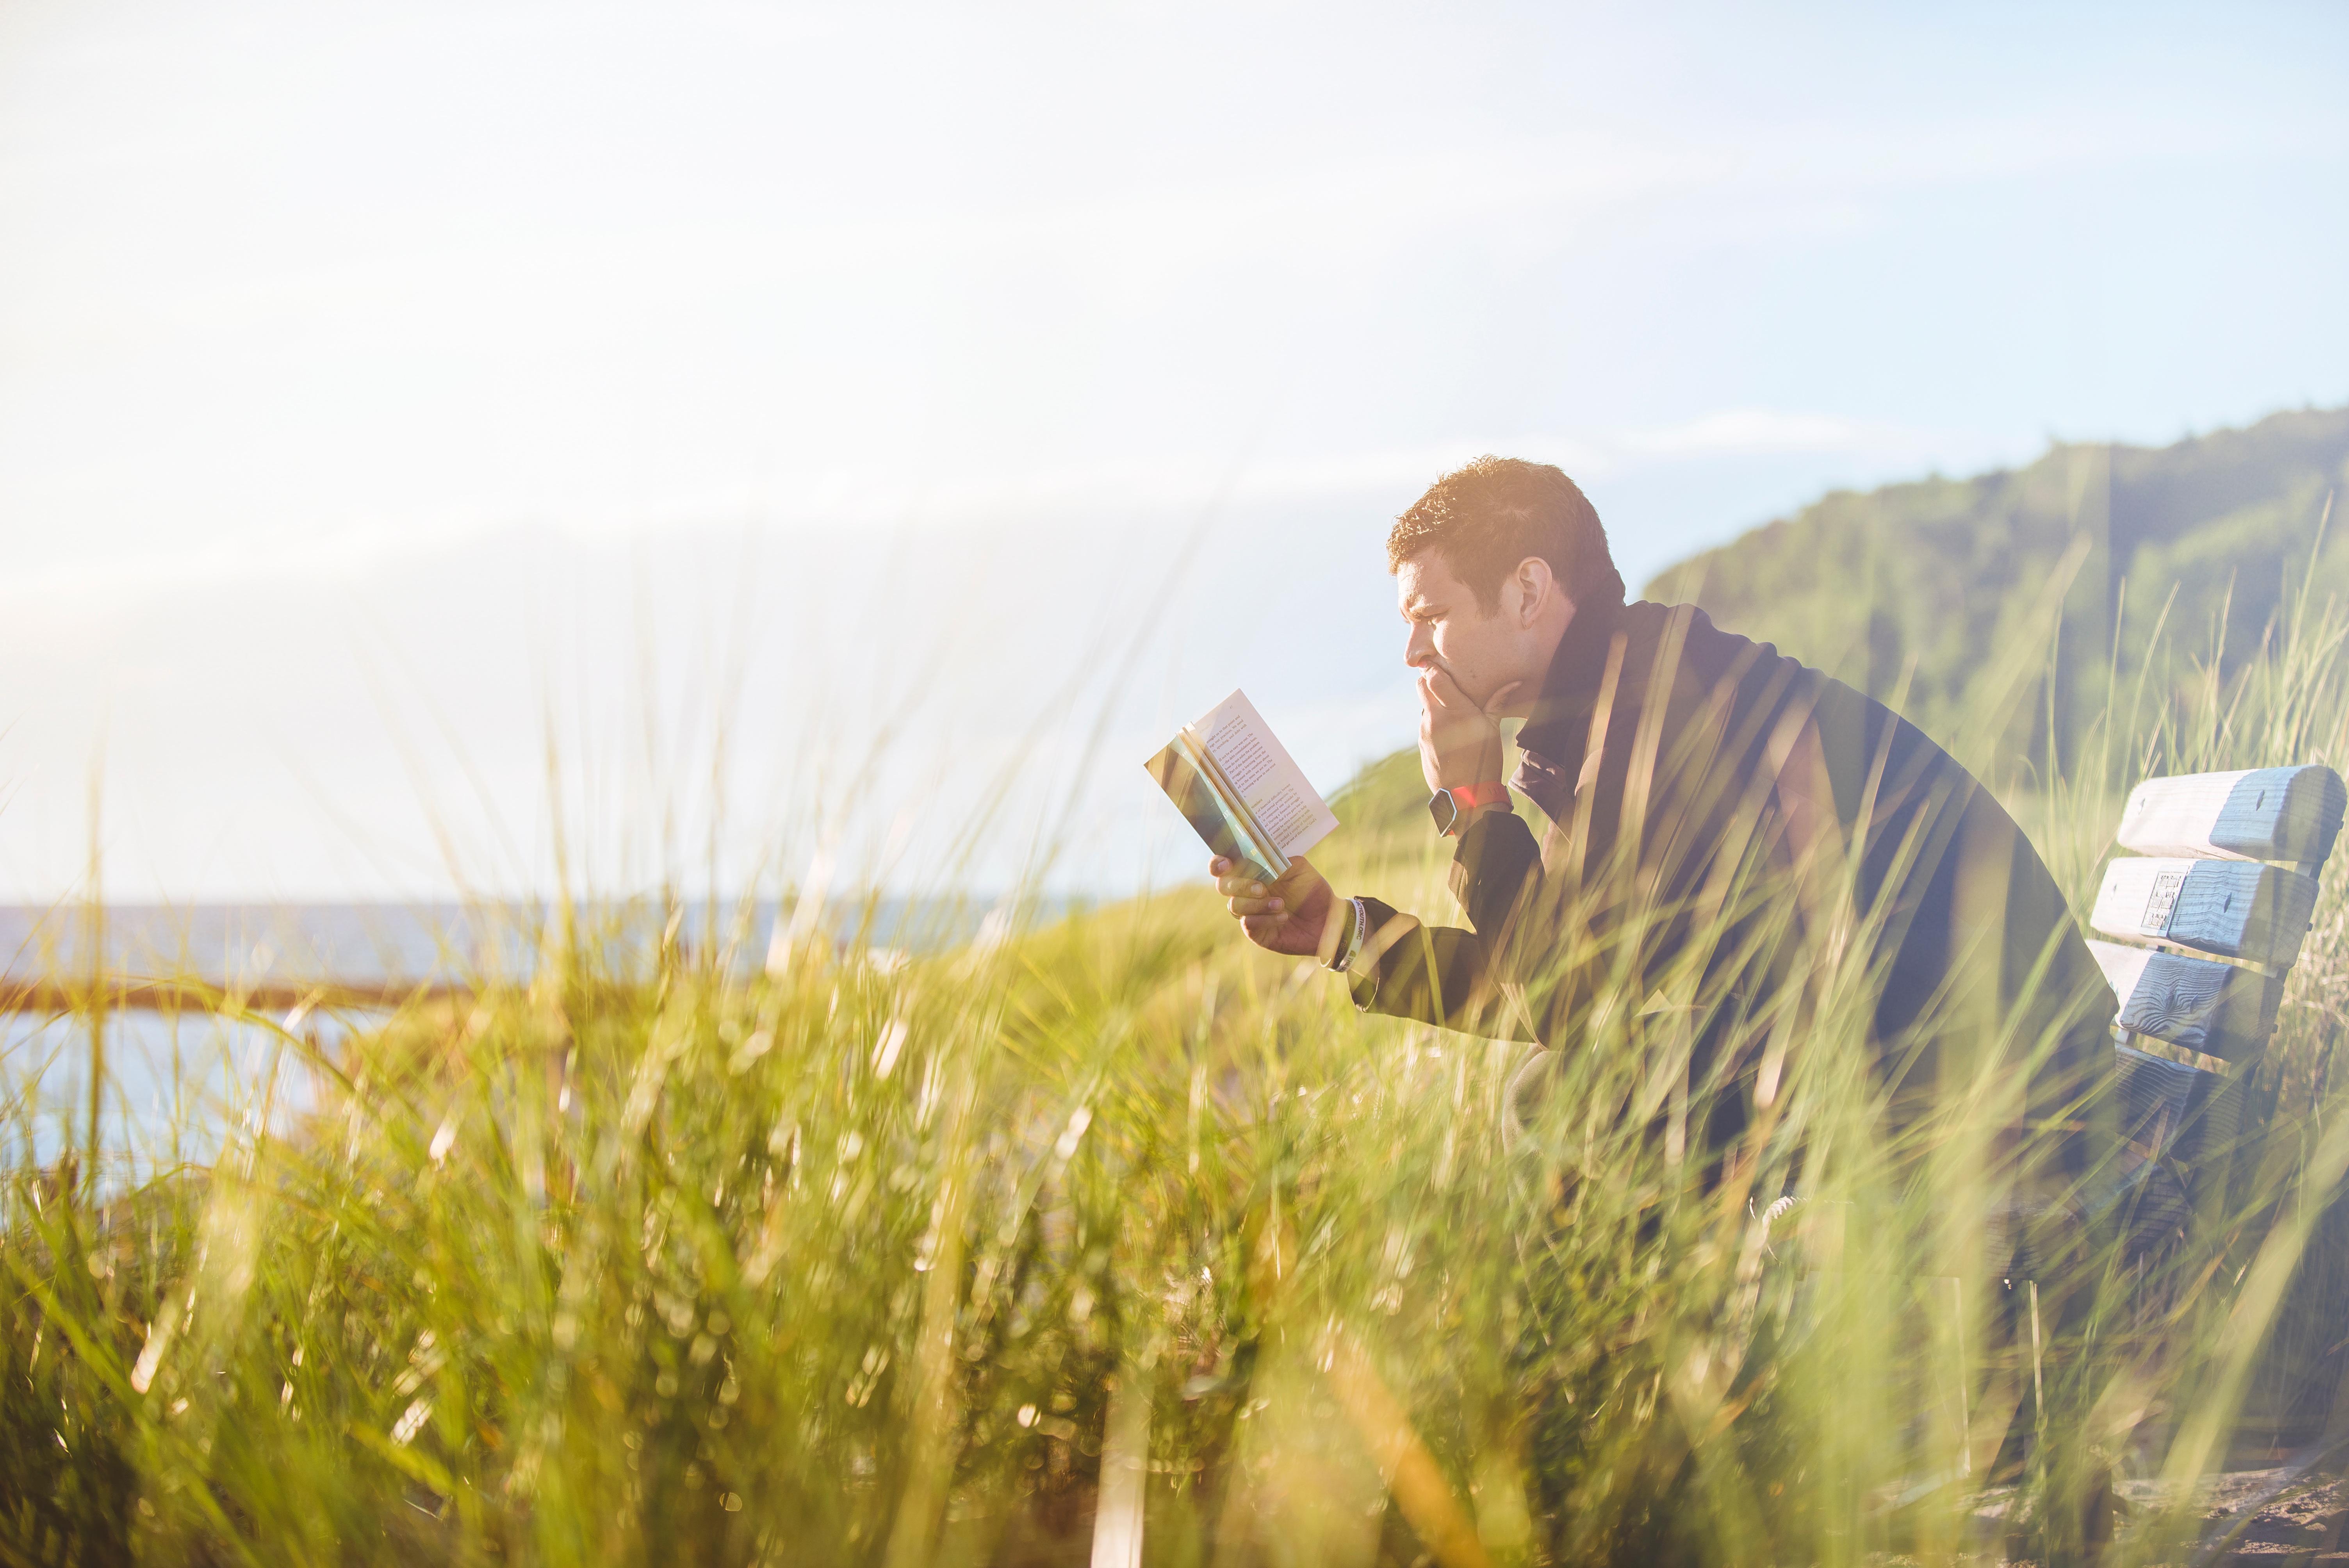 Livros para empreendedores: empreendedor sentado lendo